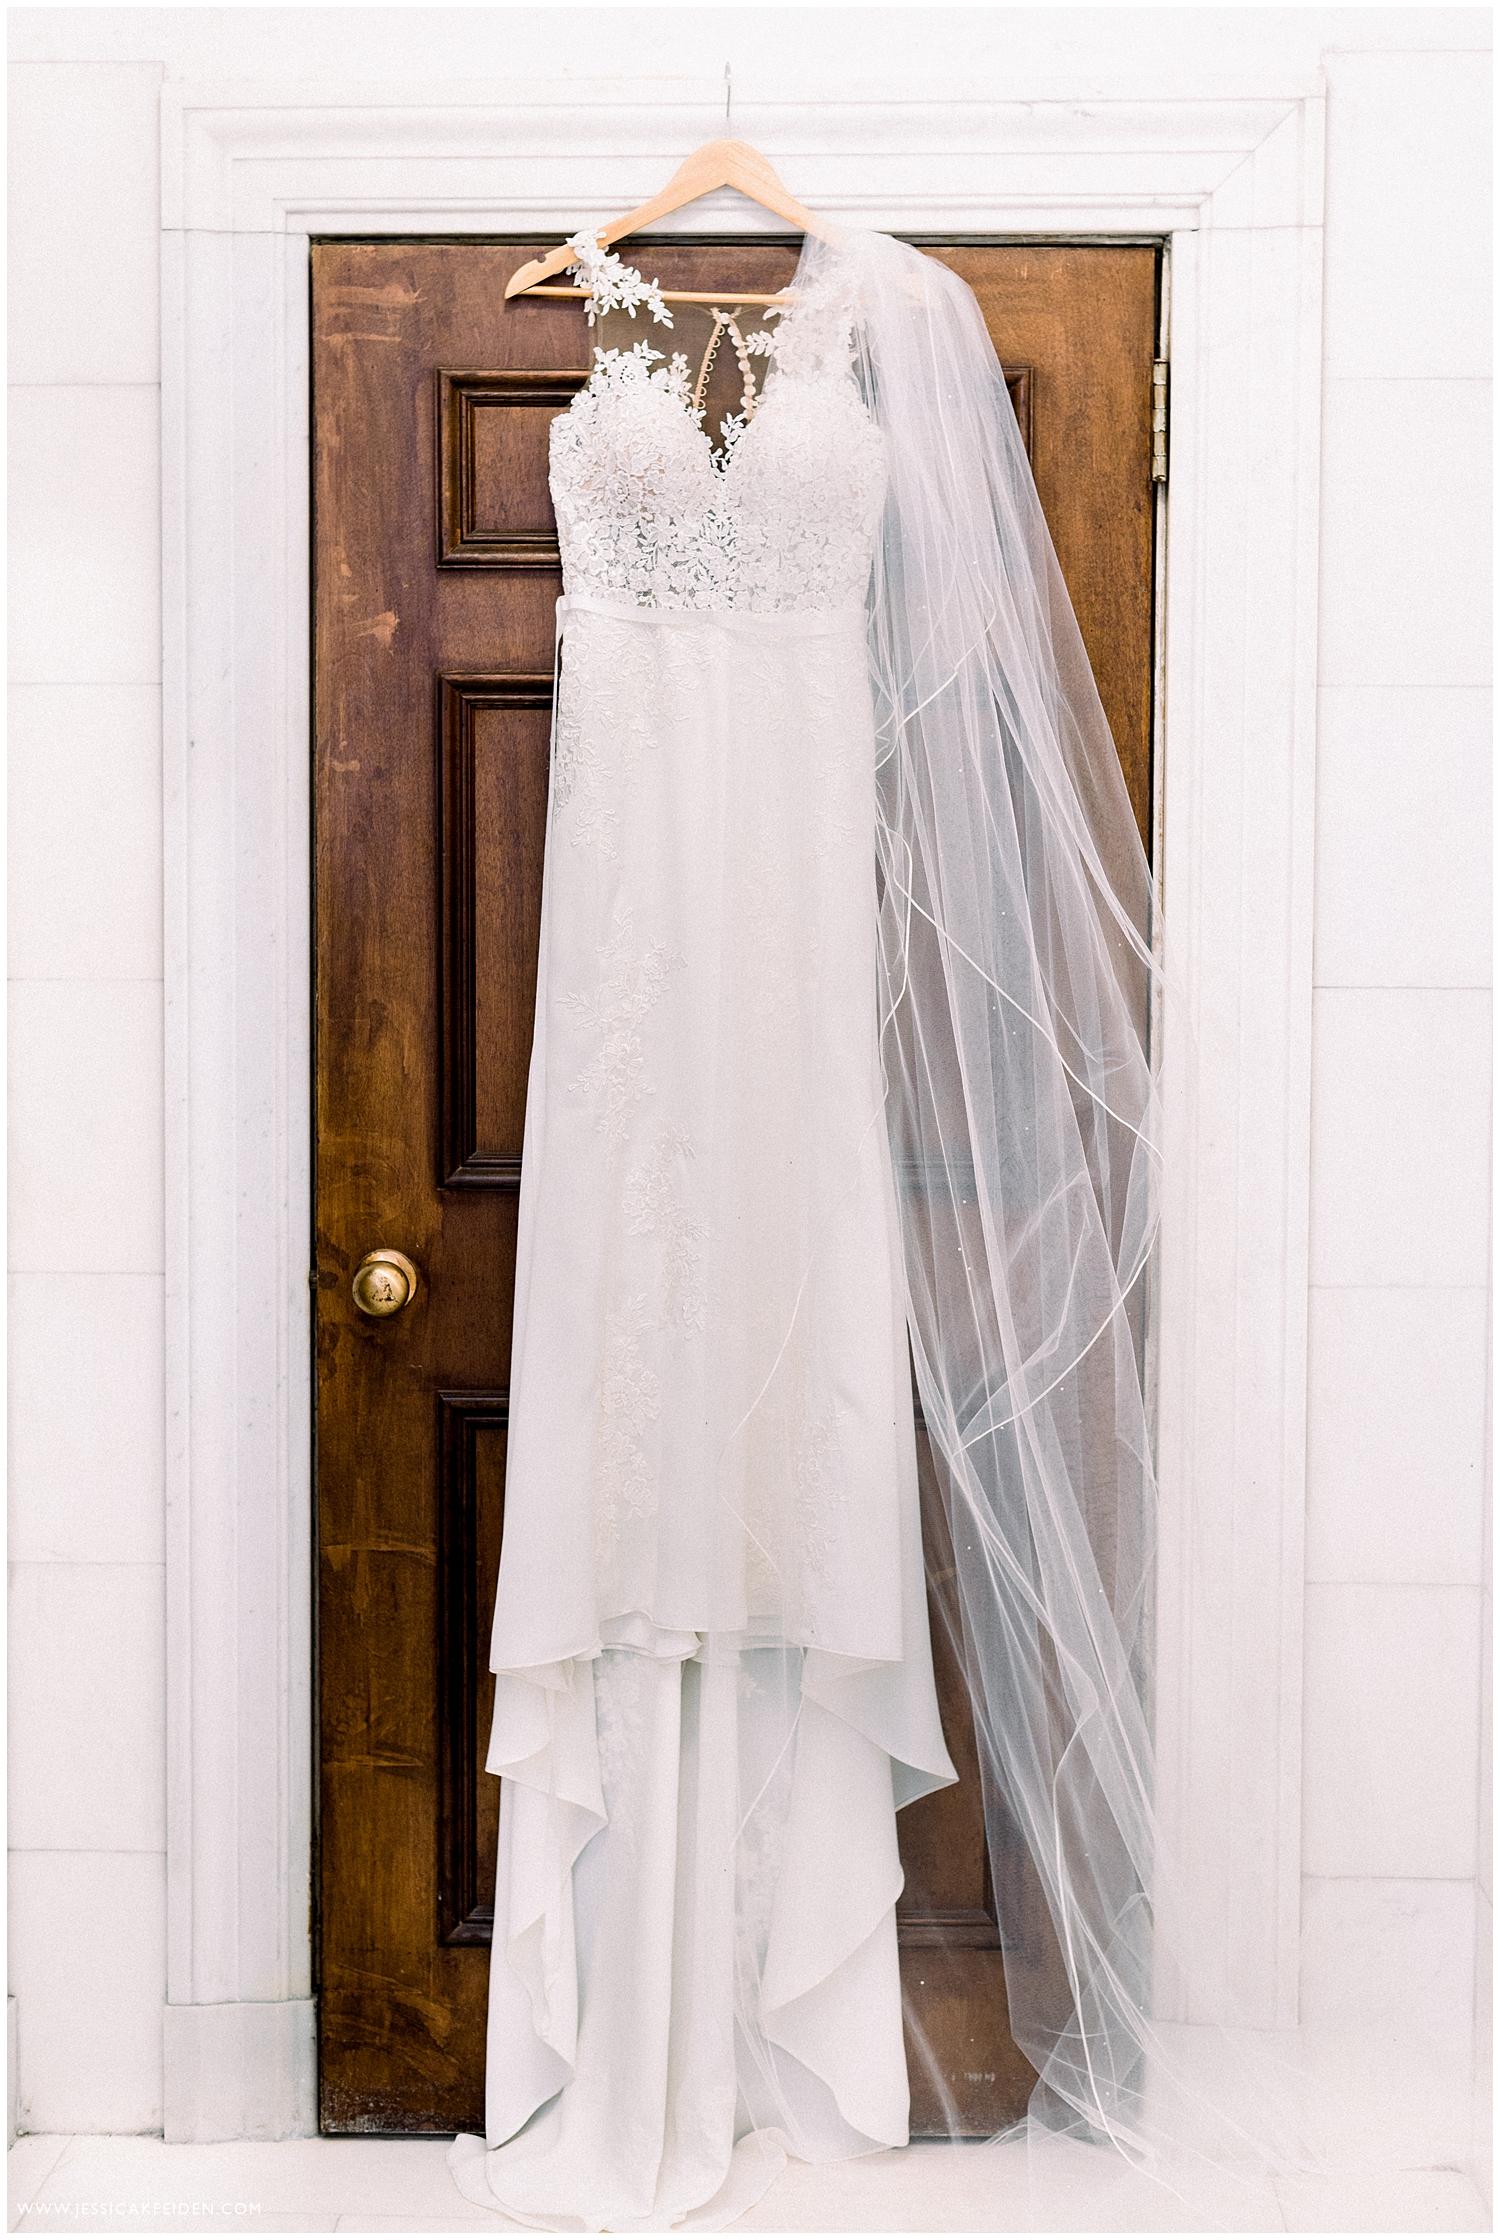 Jessica K Feiden Photography_NYIT de Seversky Mansion Long Island Wedding_0008.jpg